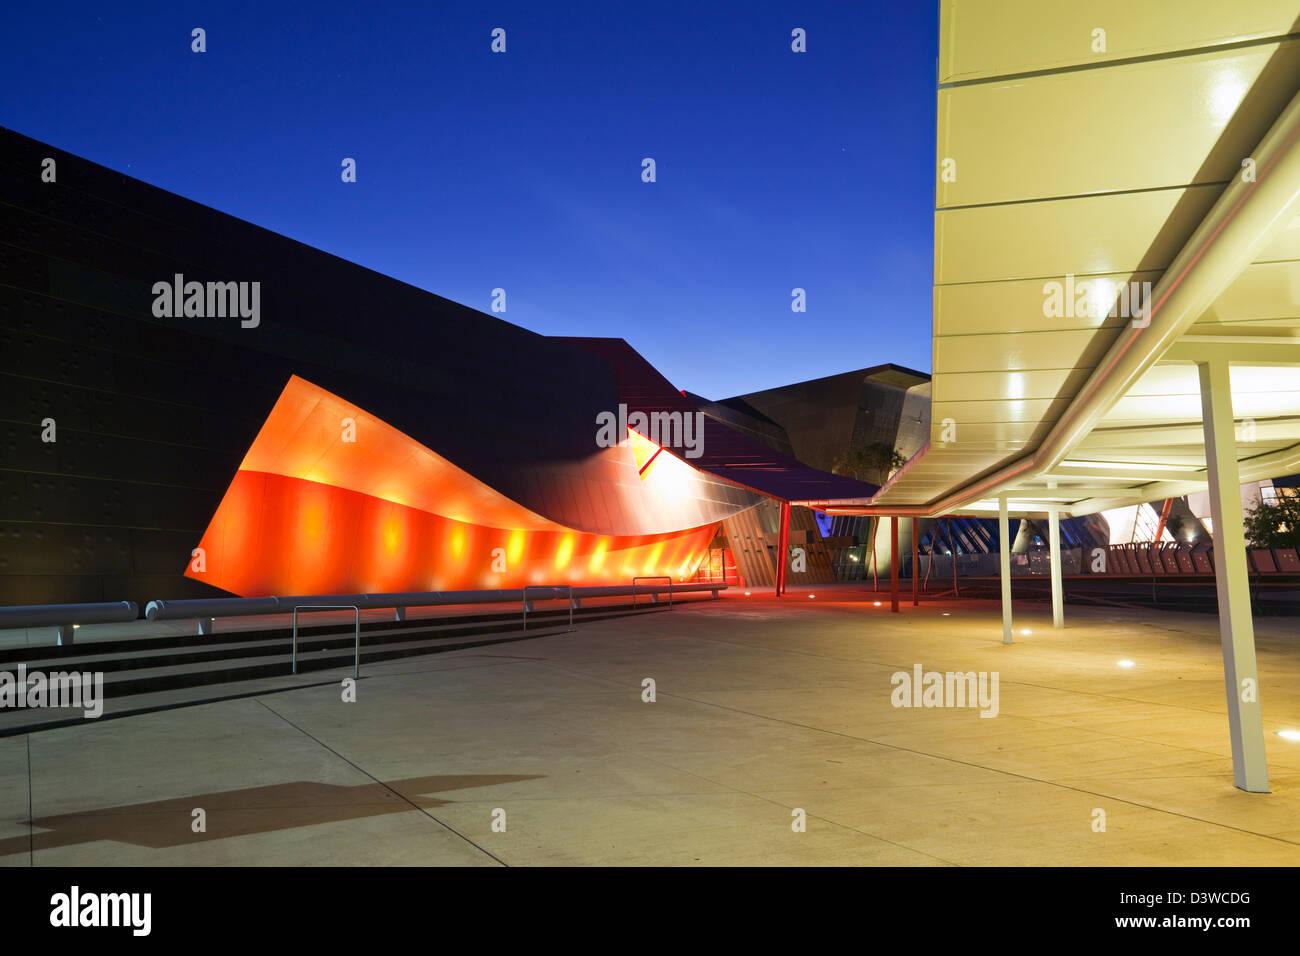 Architektur der Eingang zum National Museum of Australia. Canberra, Australian Capital Territory (ACT), Australien Stockbild